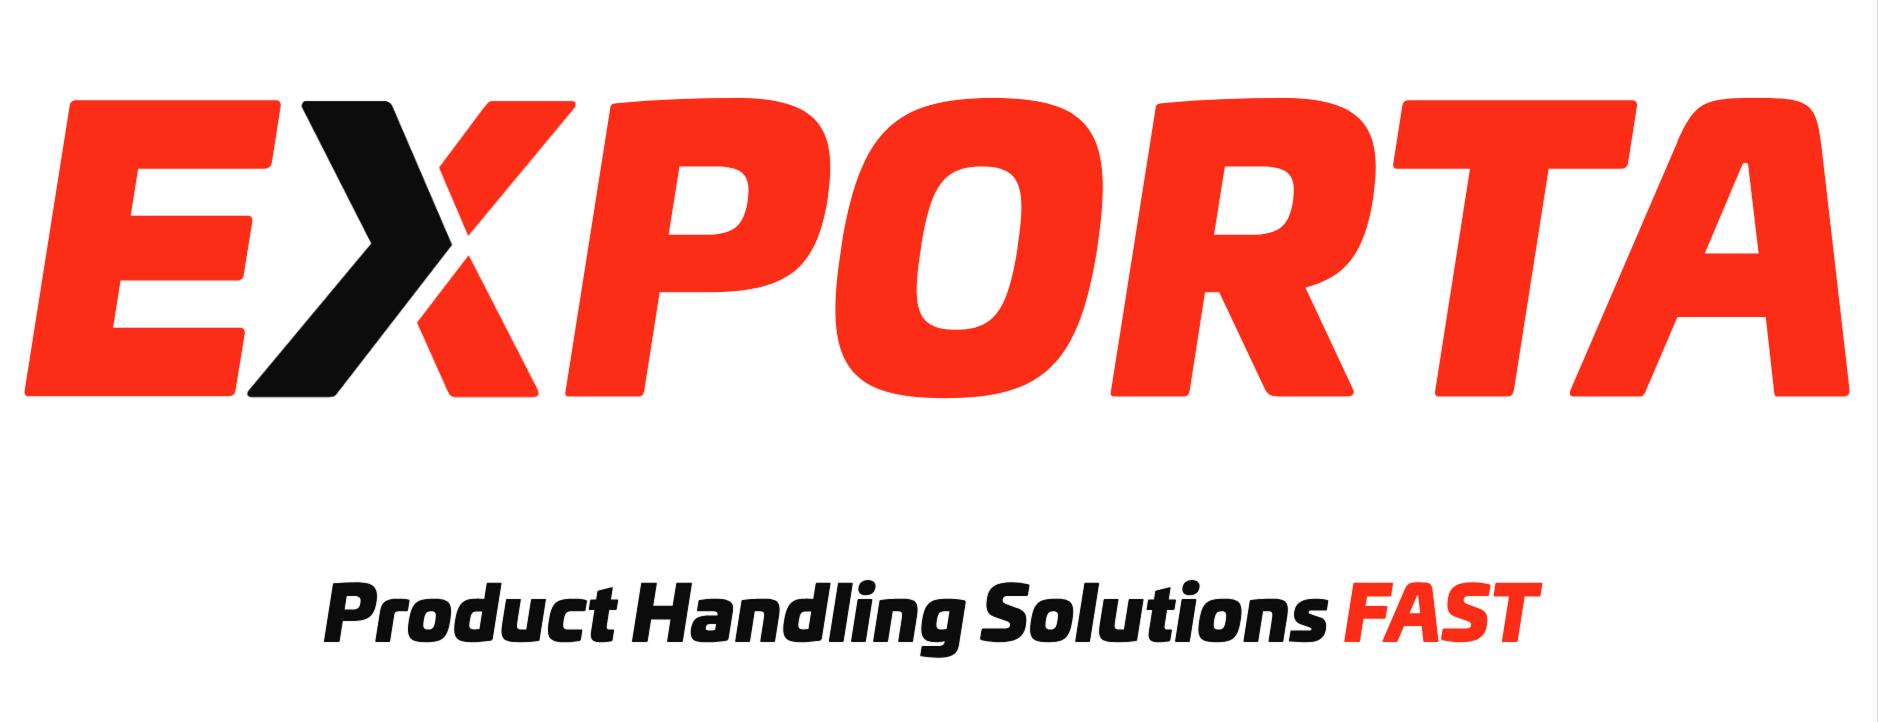 Exporta Global